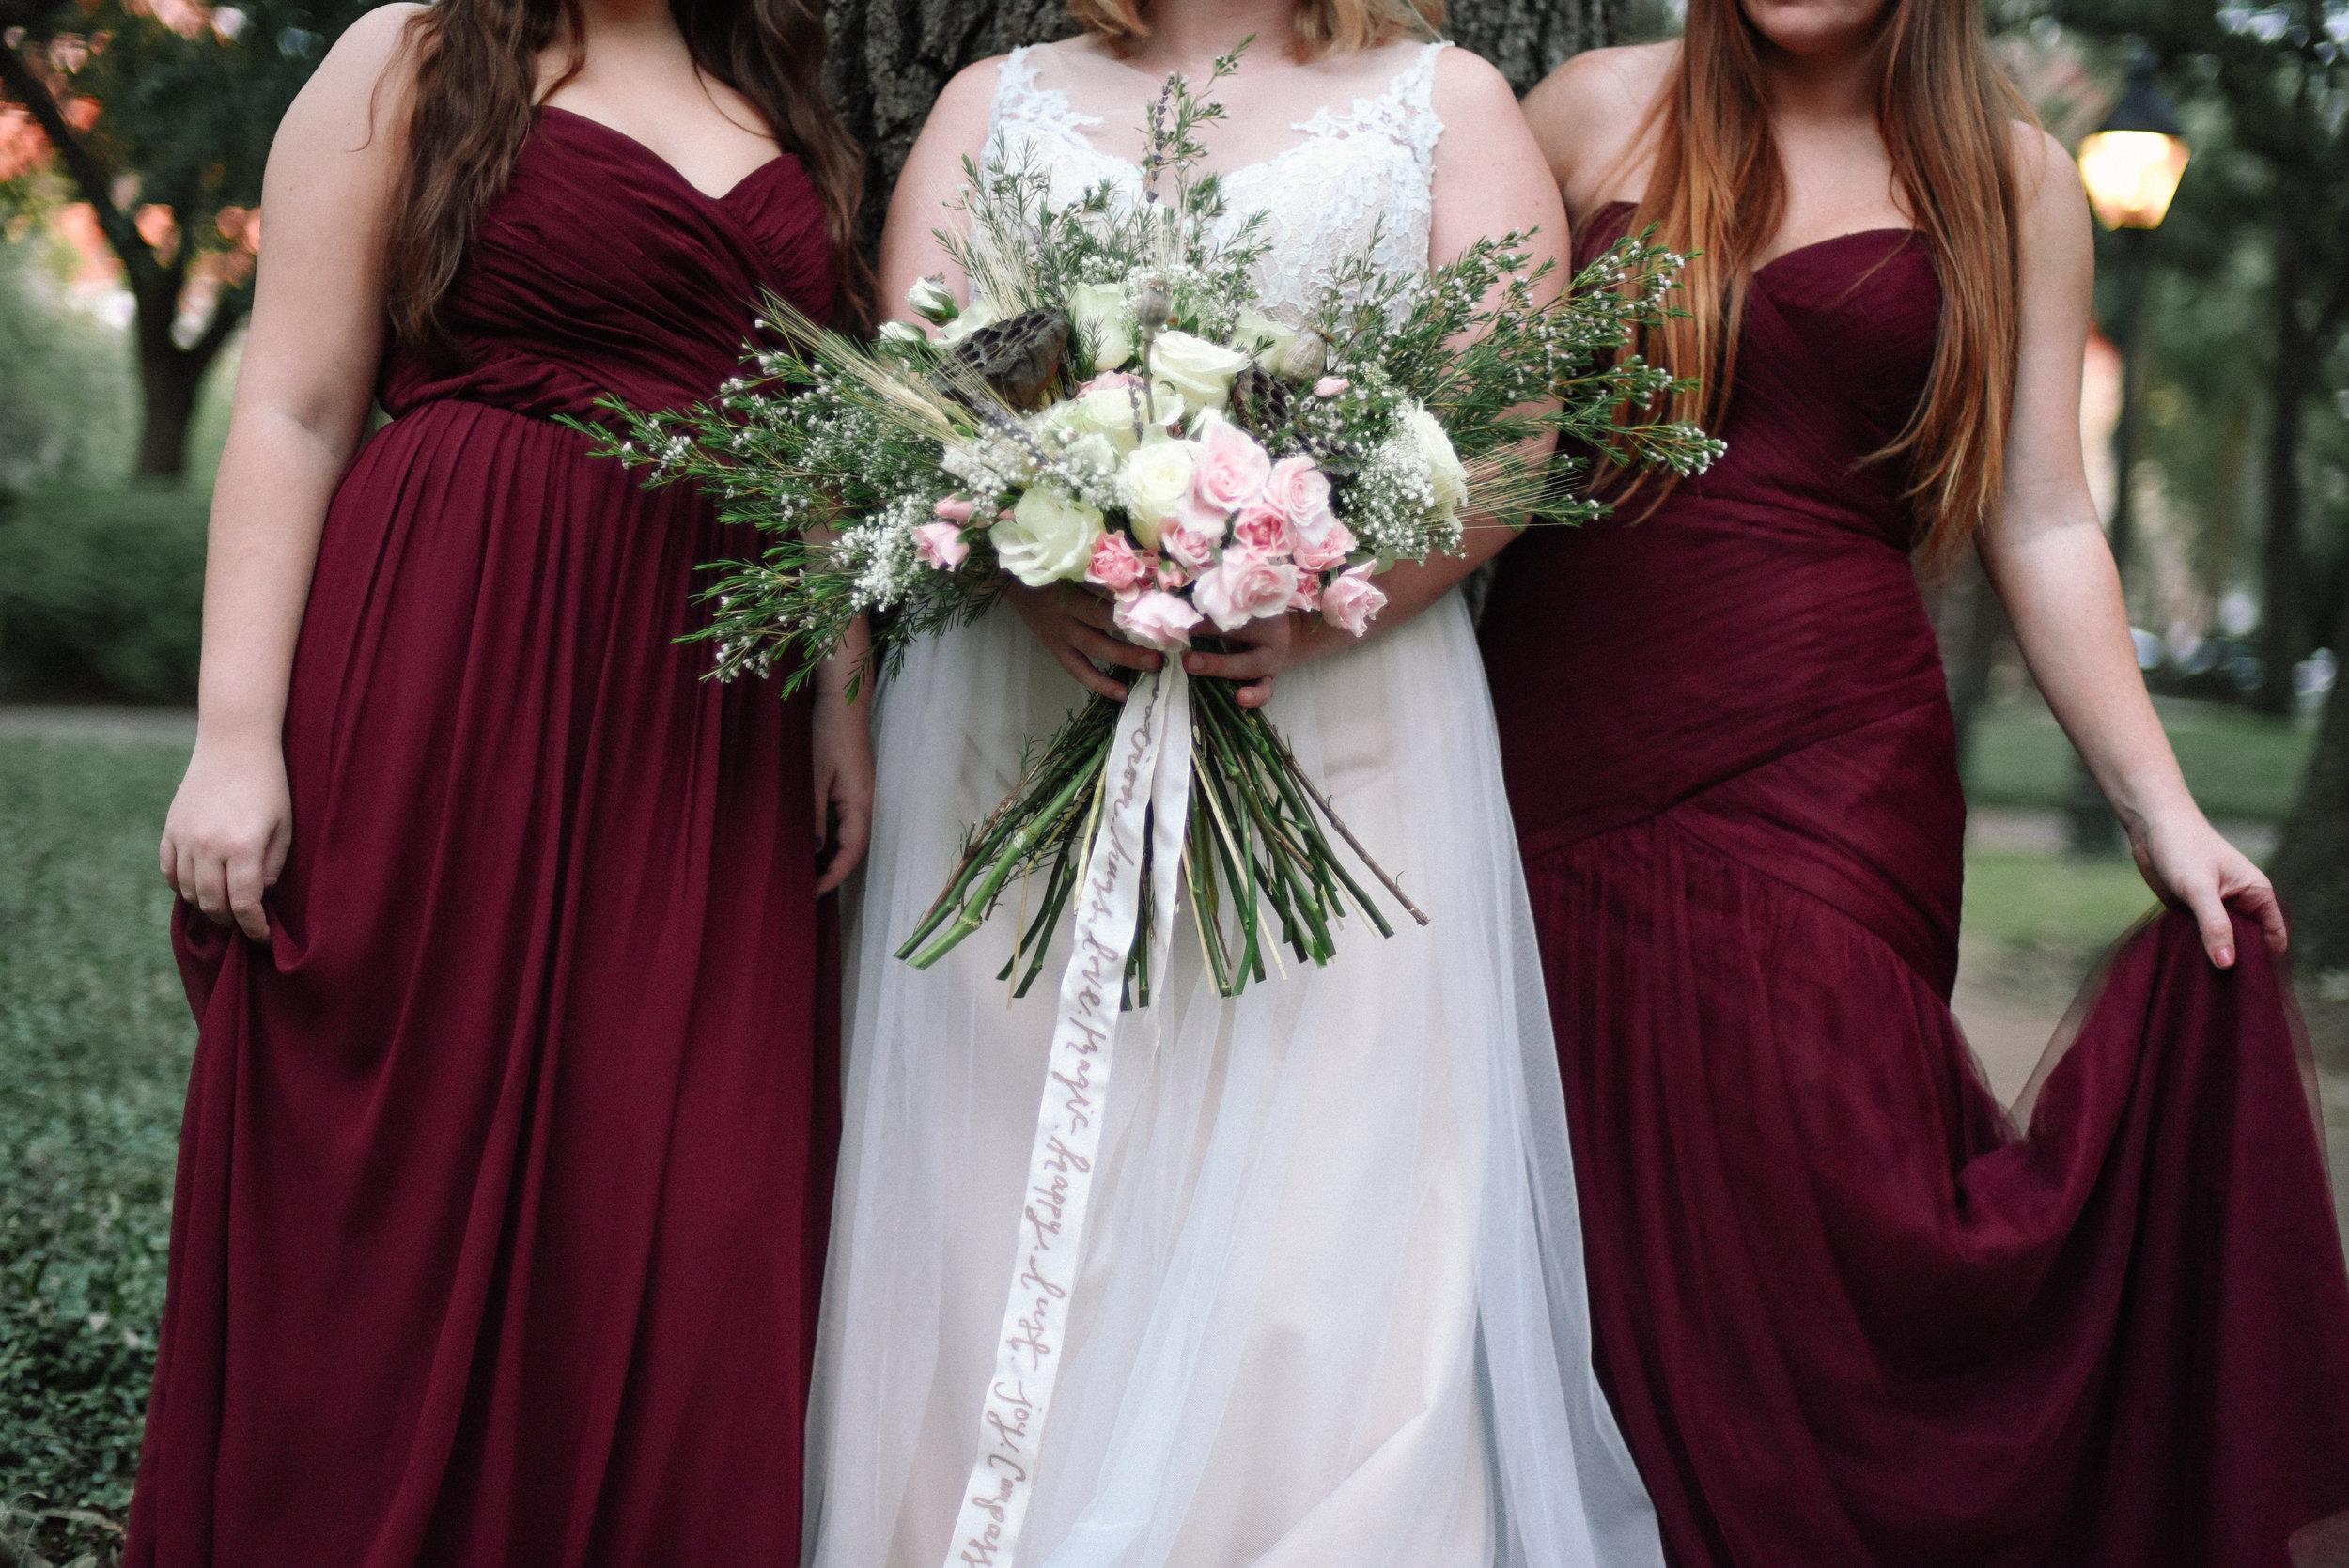 ivory-and-beau-wedding-planning-flowers-florist-calligraphy-bridesmaids-dresses-wedding-dresses-photography-bridal-boutique-savannah-georgia-southern-wedding-coordinator-event-coordinator-bride.JPG